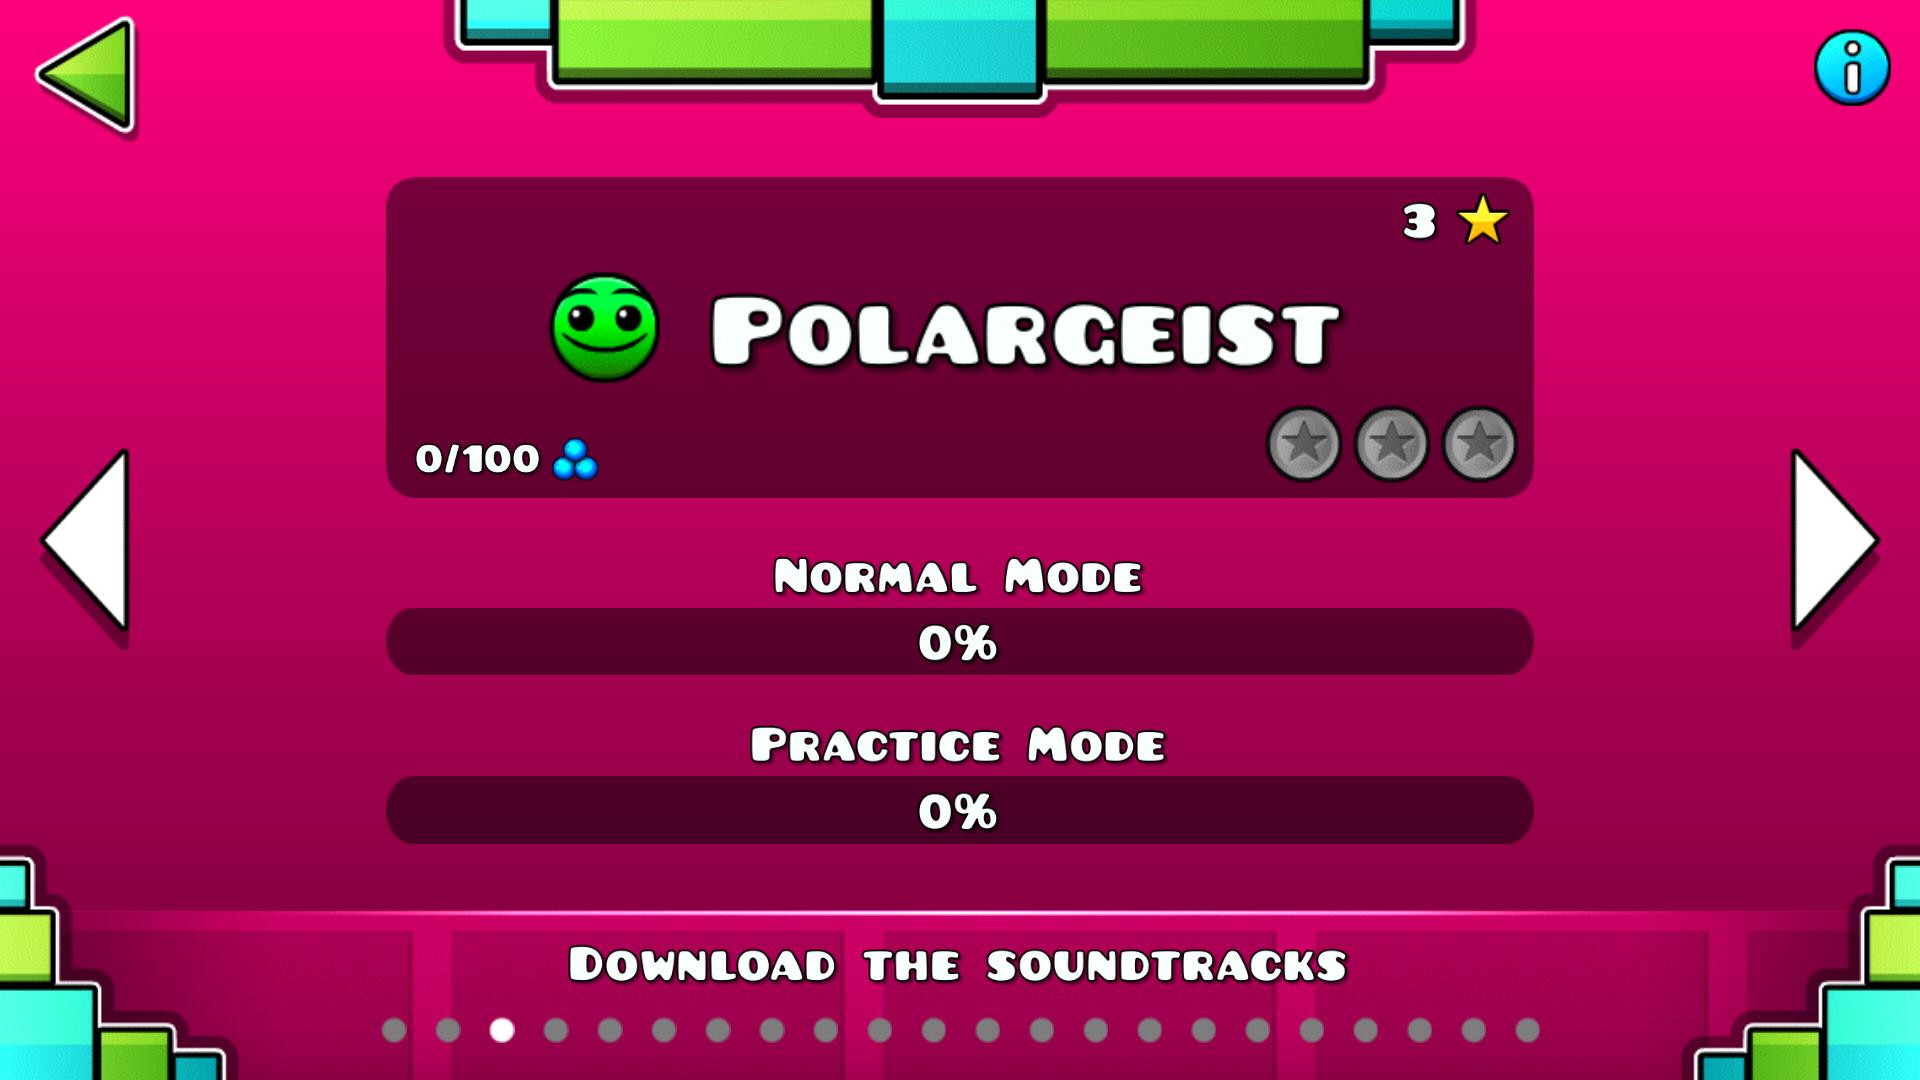 PolargeistMenu.png